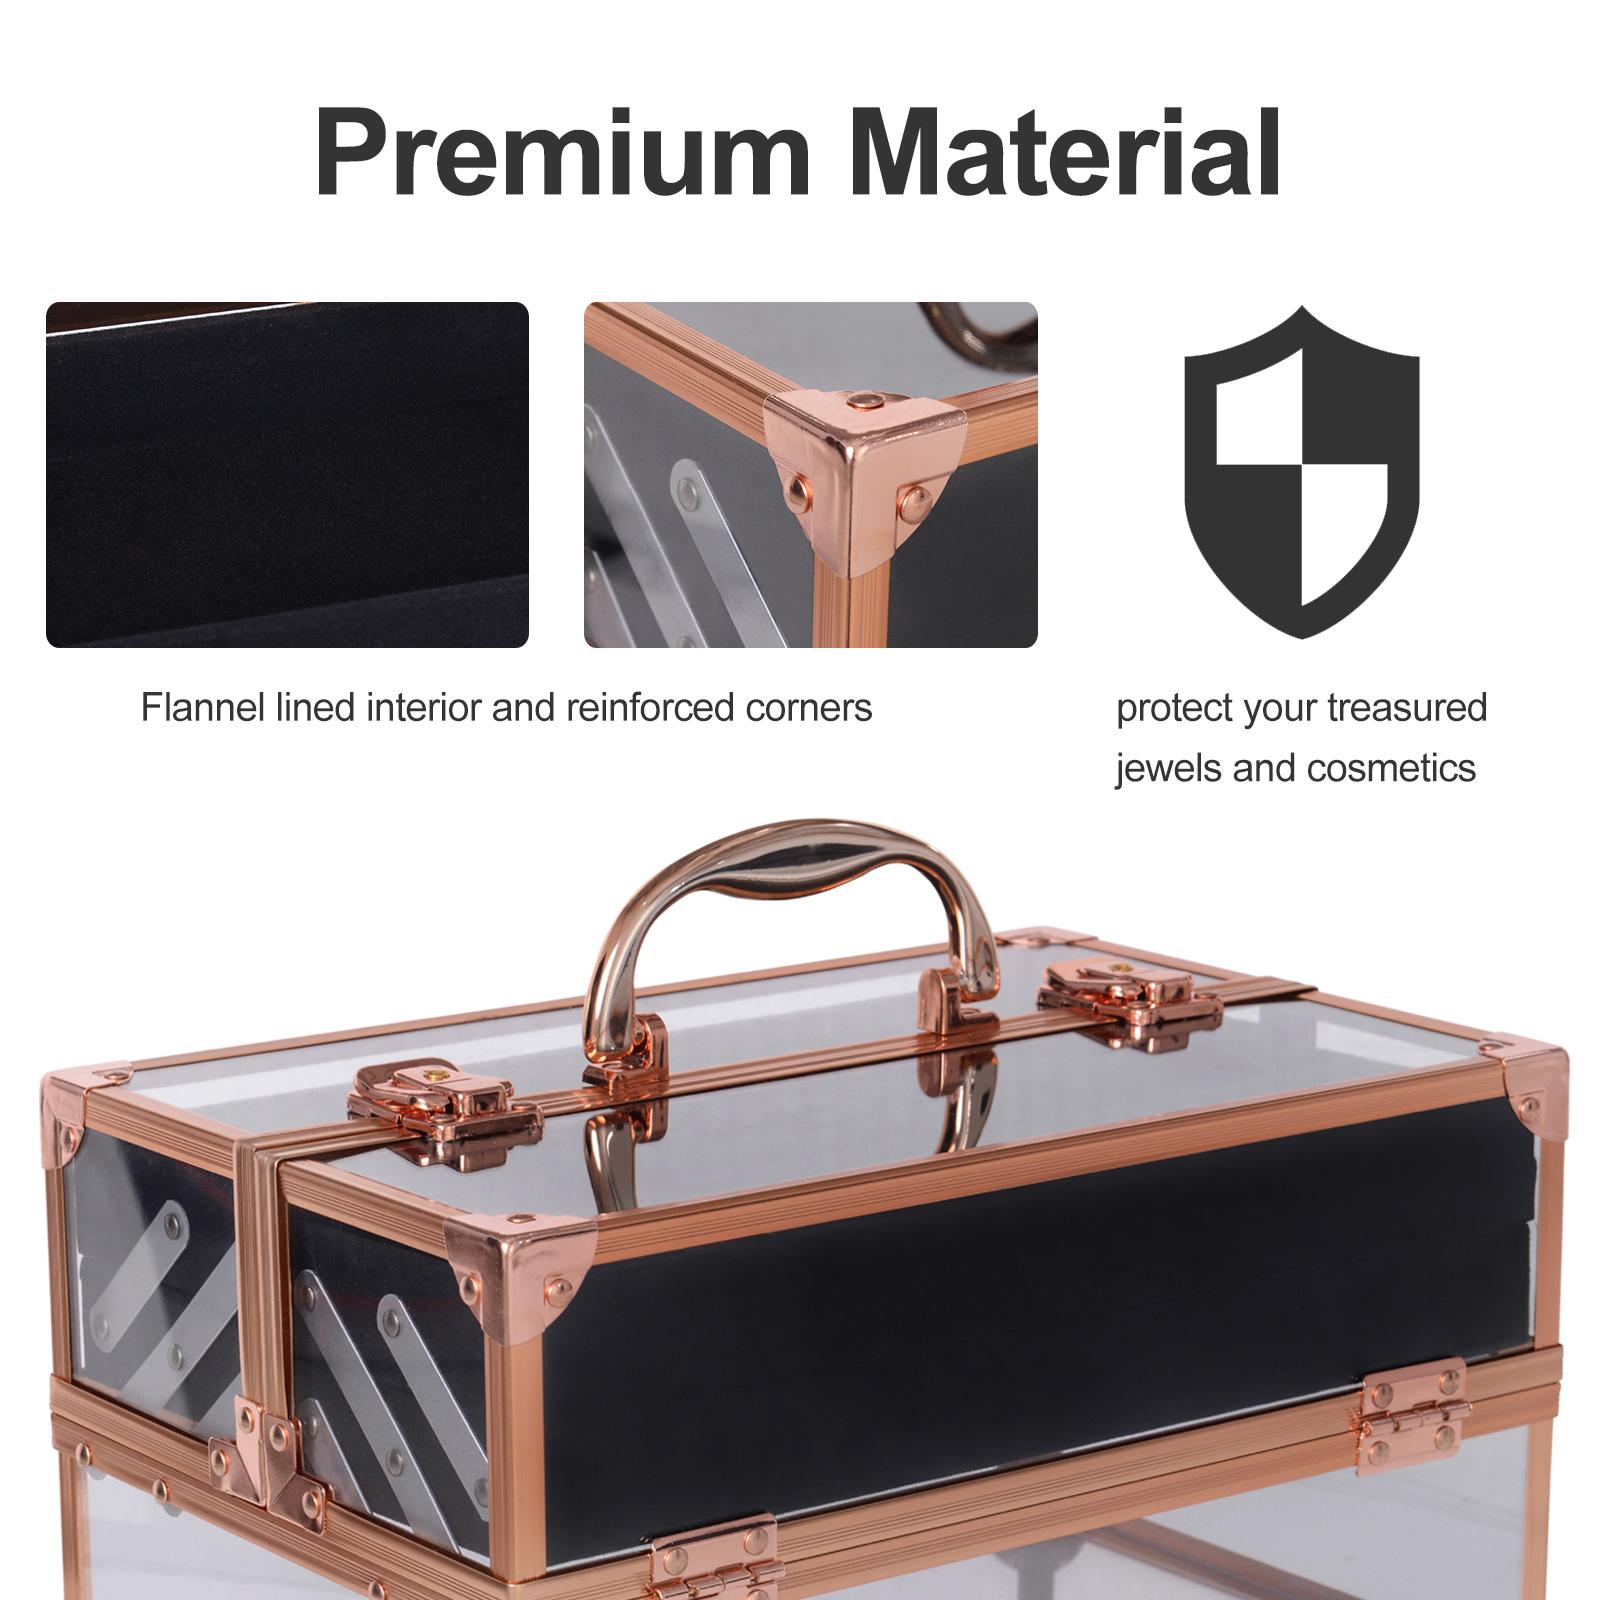 Portable-Makeup-Case-Train-Case-Lockable-Aluminum-with-4-Trays thumbnail 11